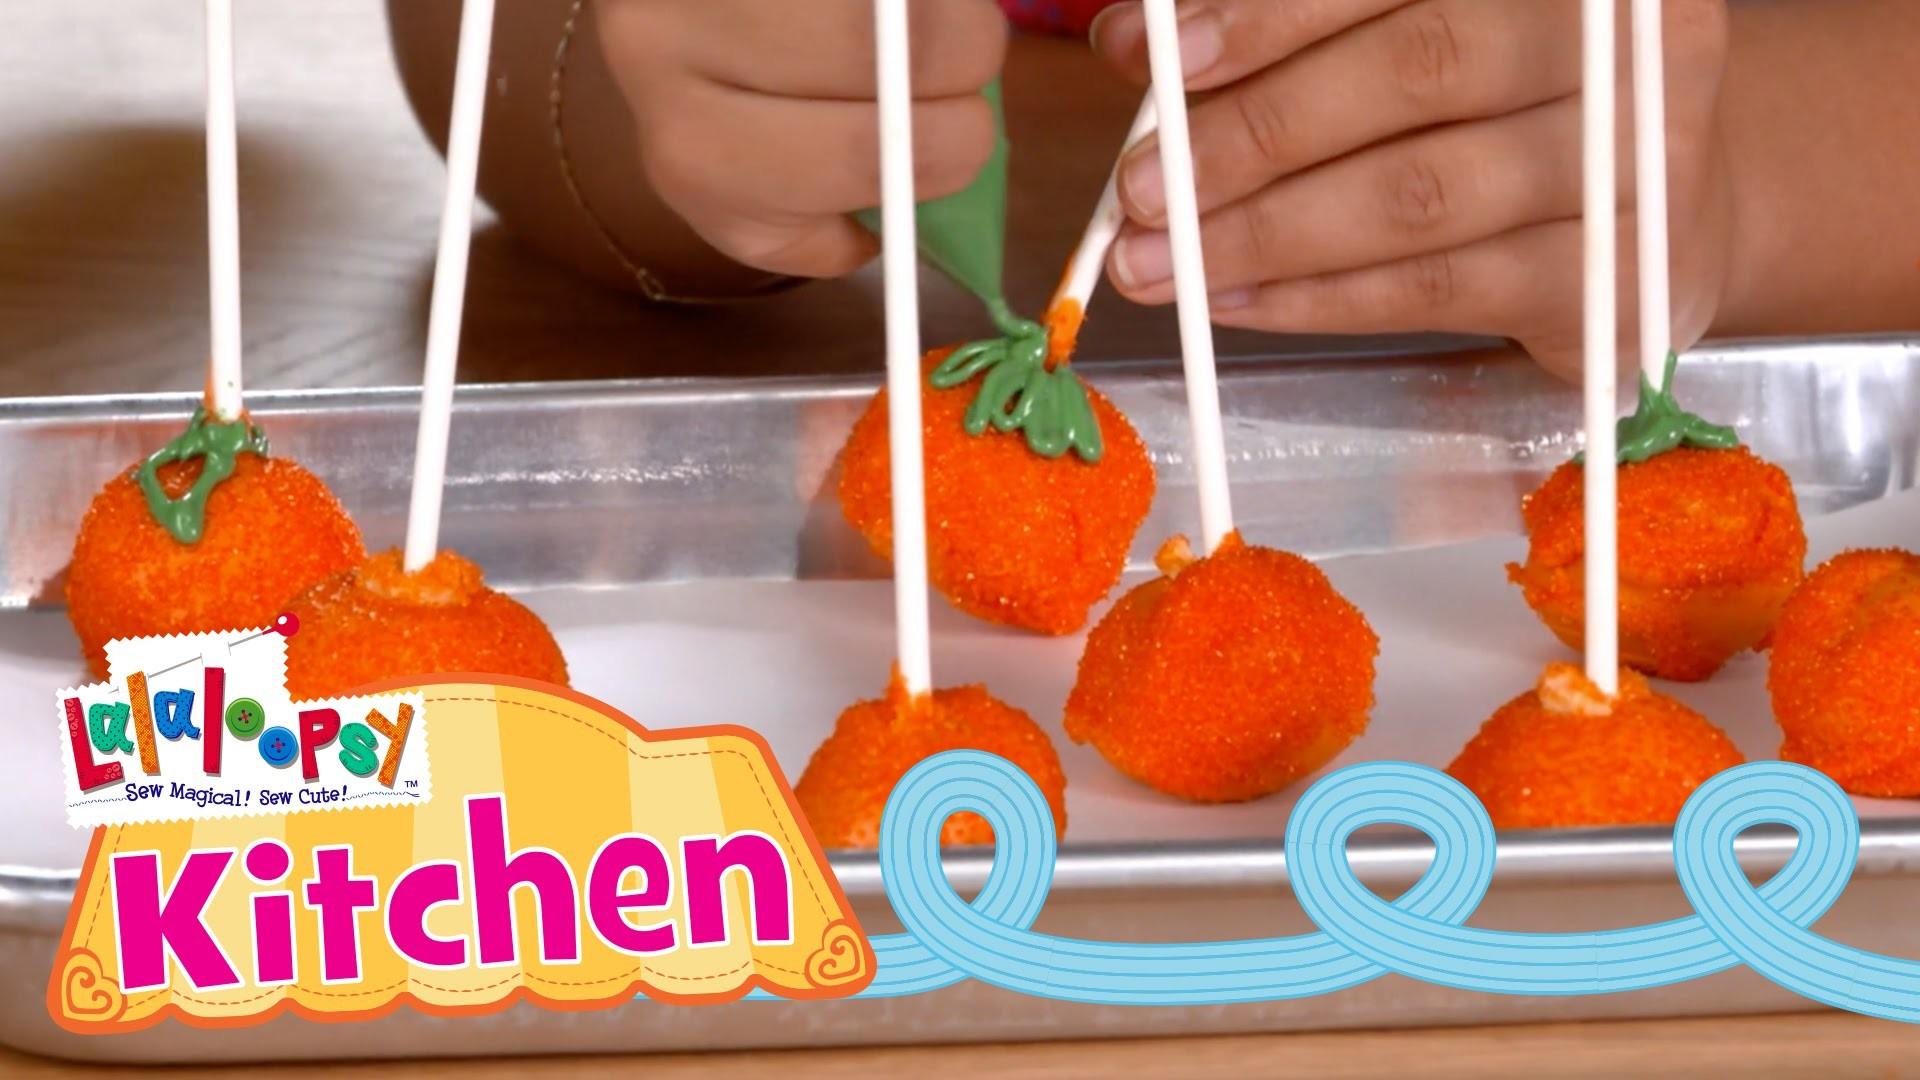 Lalaloopsy Kitchen: How to Make Pumpkin Cake Pops | Episode 10 | Lalaloopsy